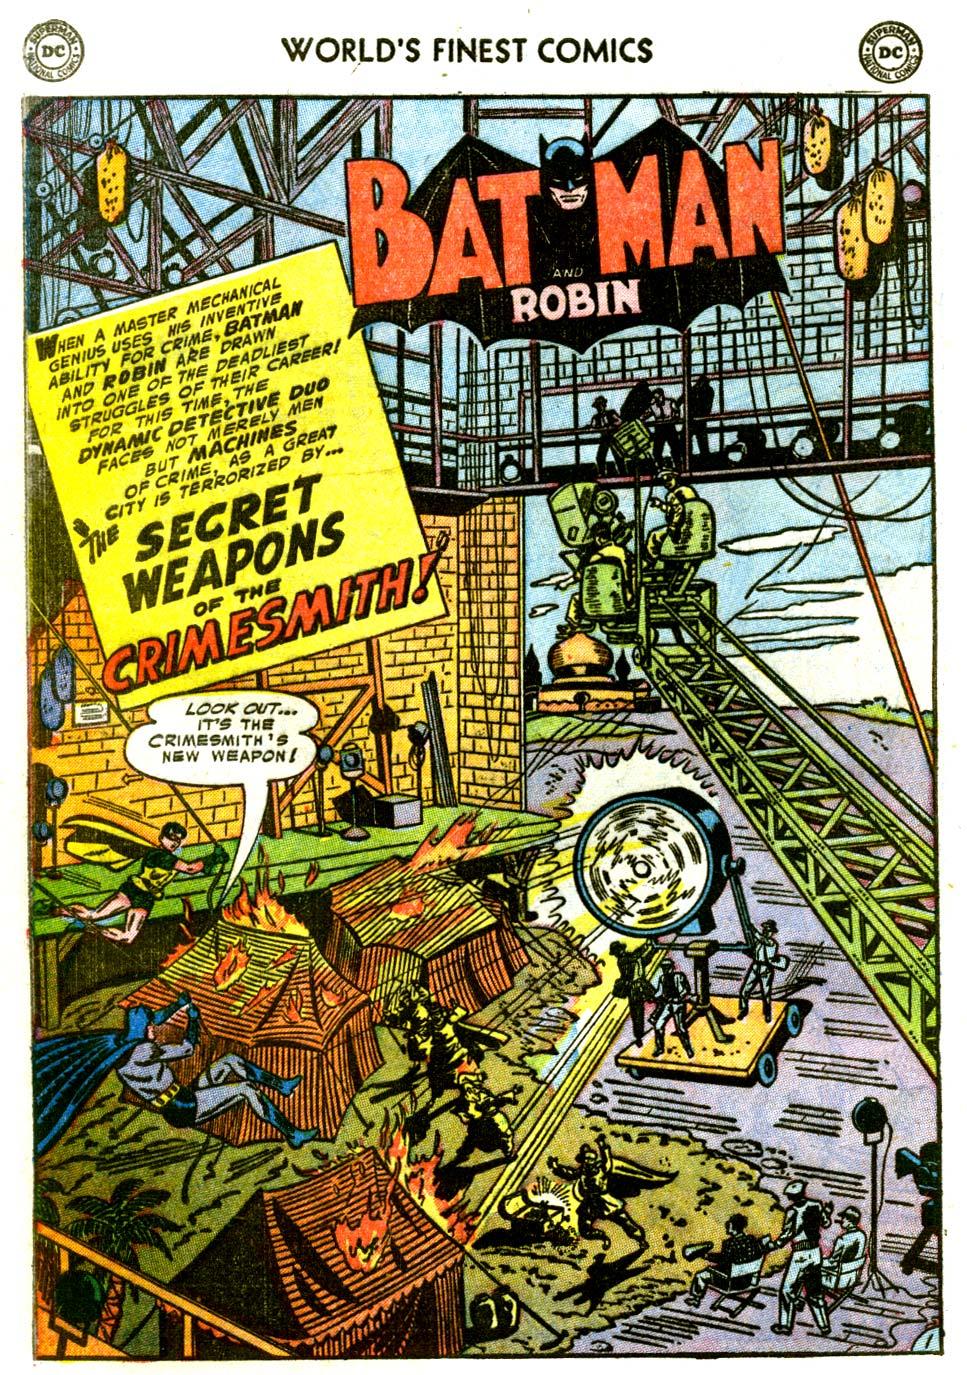 Read online World's Finest Comics comic -  Issue #68 - 54